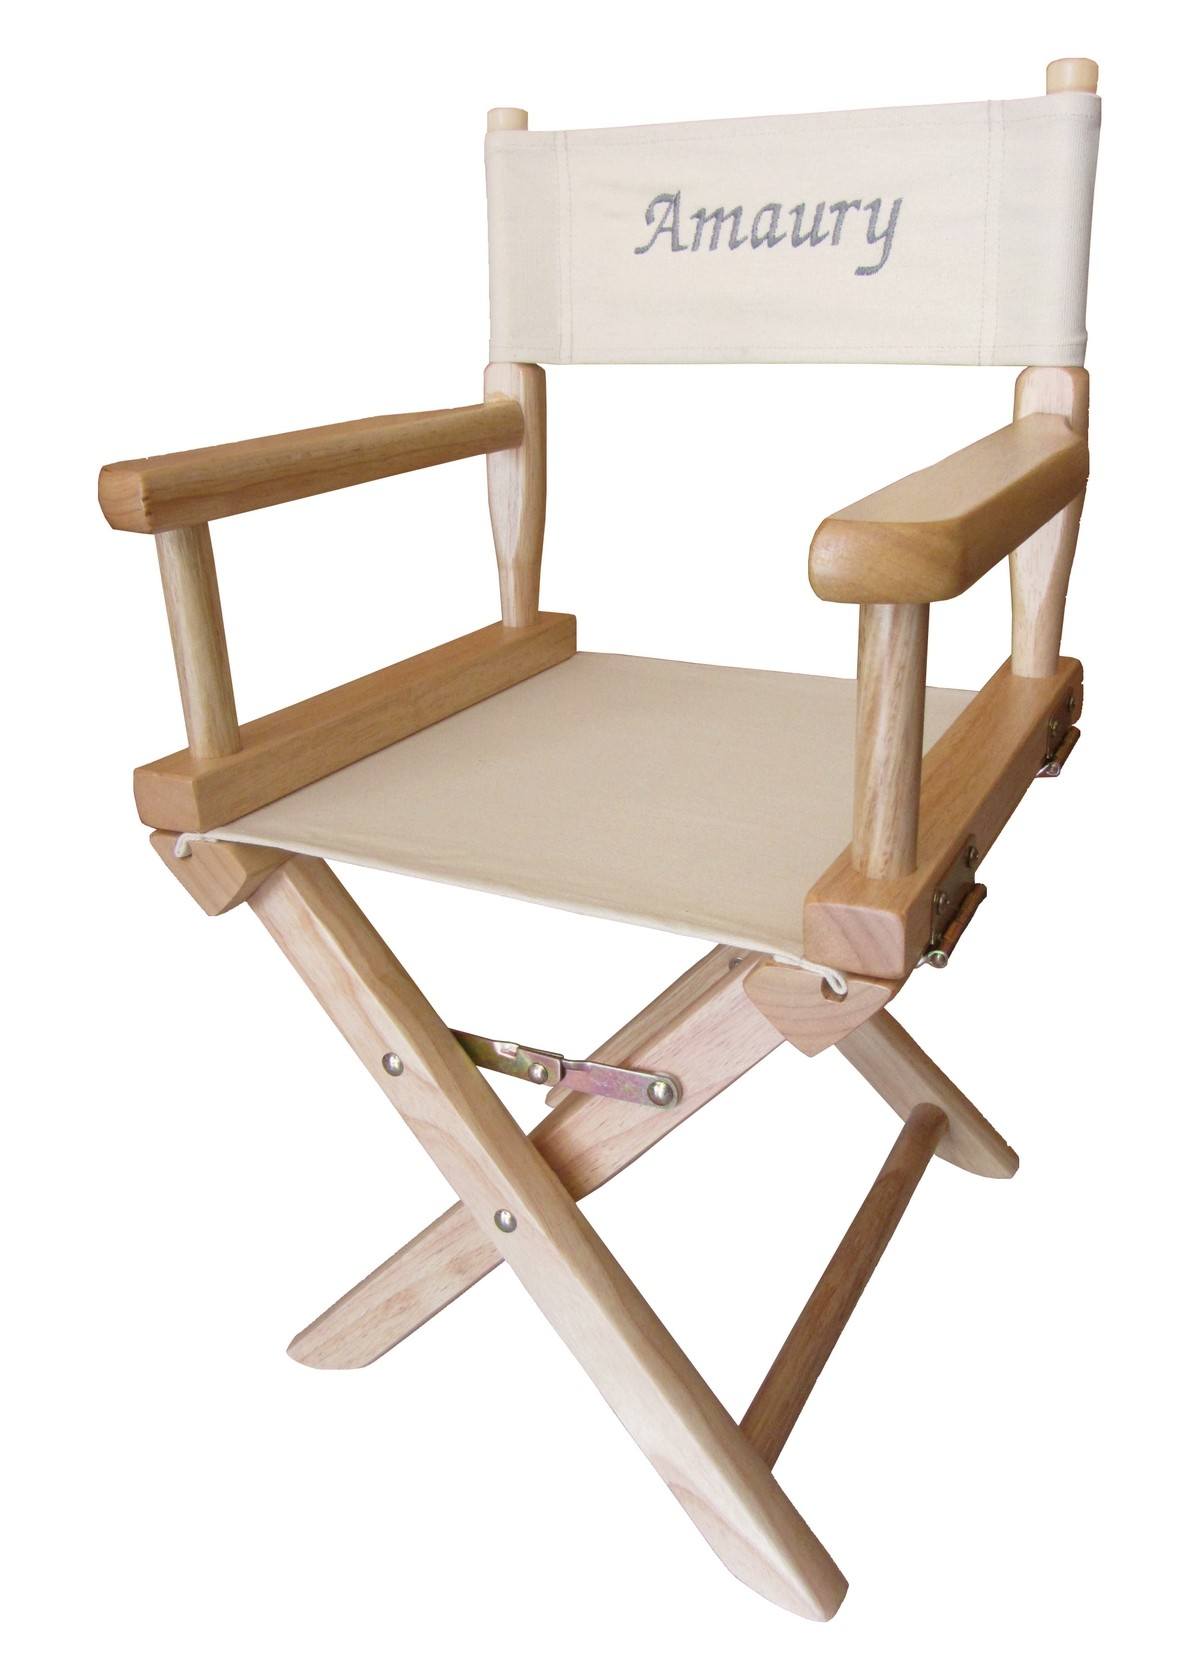 fauteuil metteur en scene fauteuil metteur en scene acacia et coton fauteuil metteur en scene. Black Bedroom Furniture Sets. Home Design Ideas